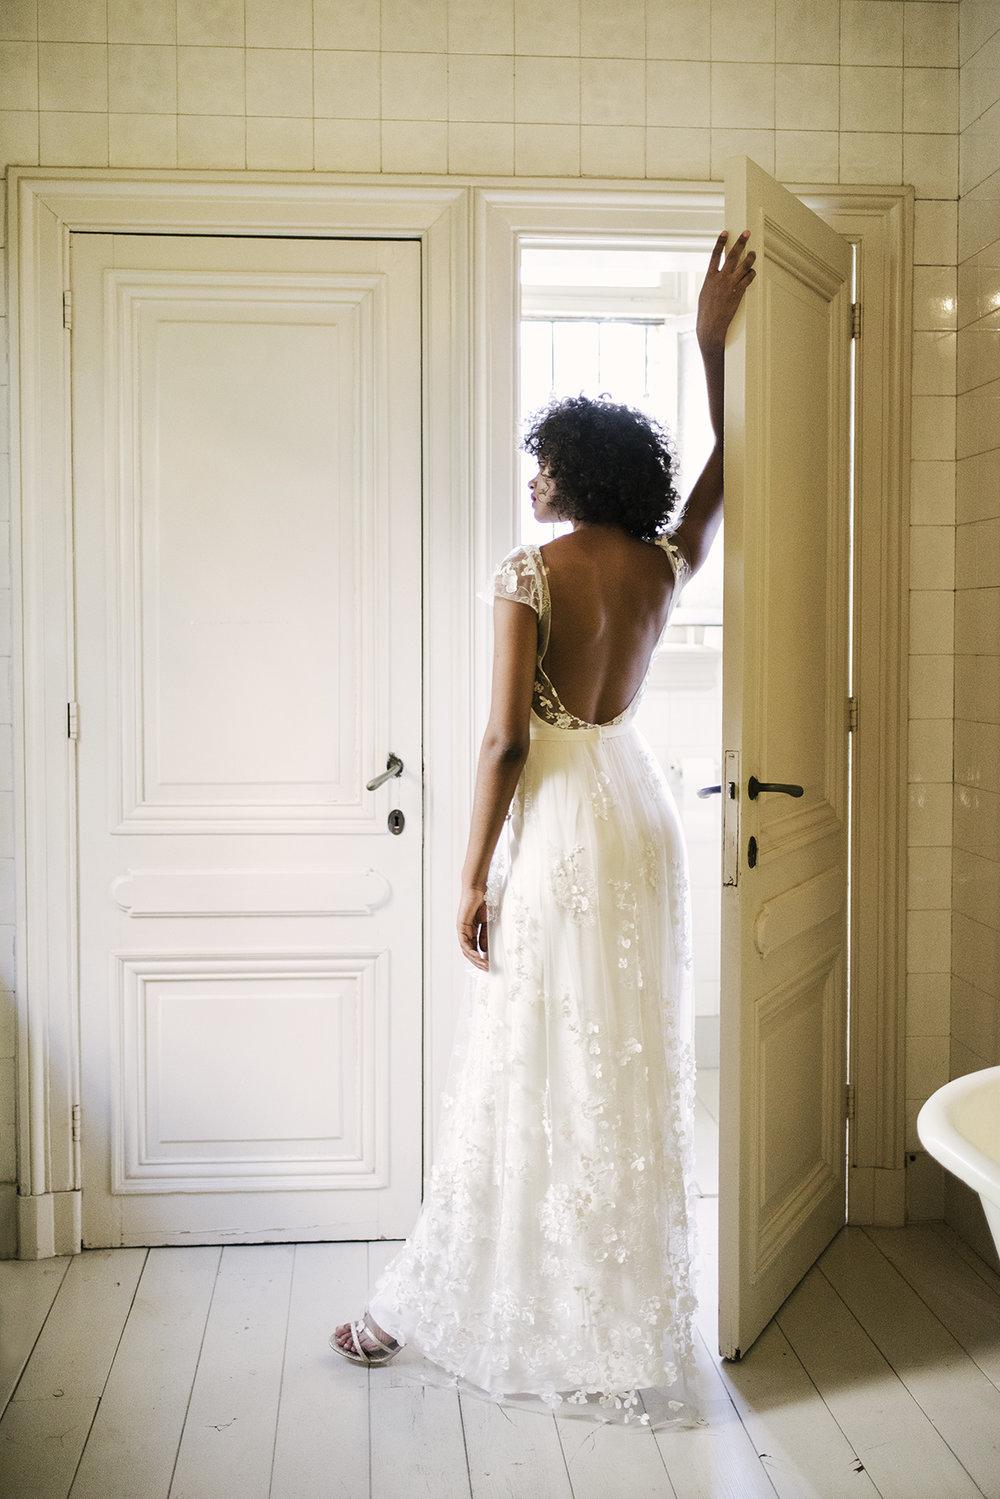 valentine-avoh-robe-mariee-jackie-wedding-dress-photo-elodie-timmermans-59.jpg